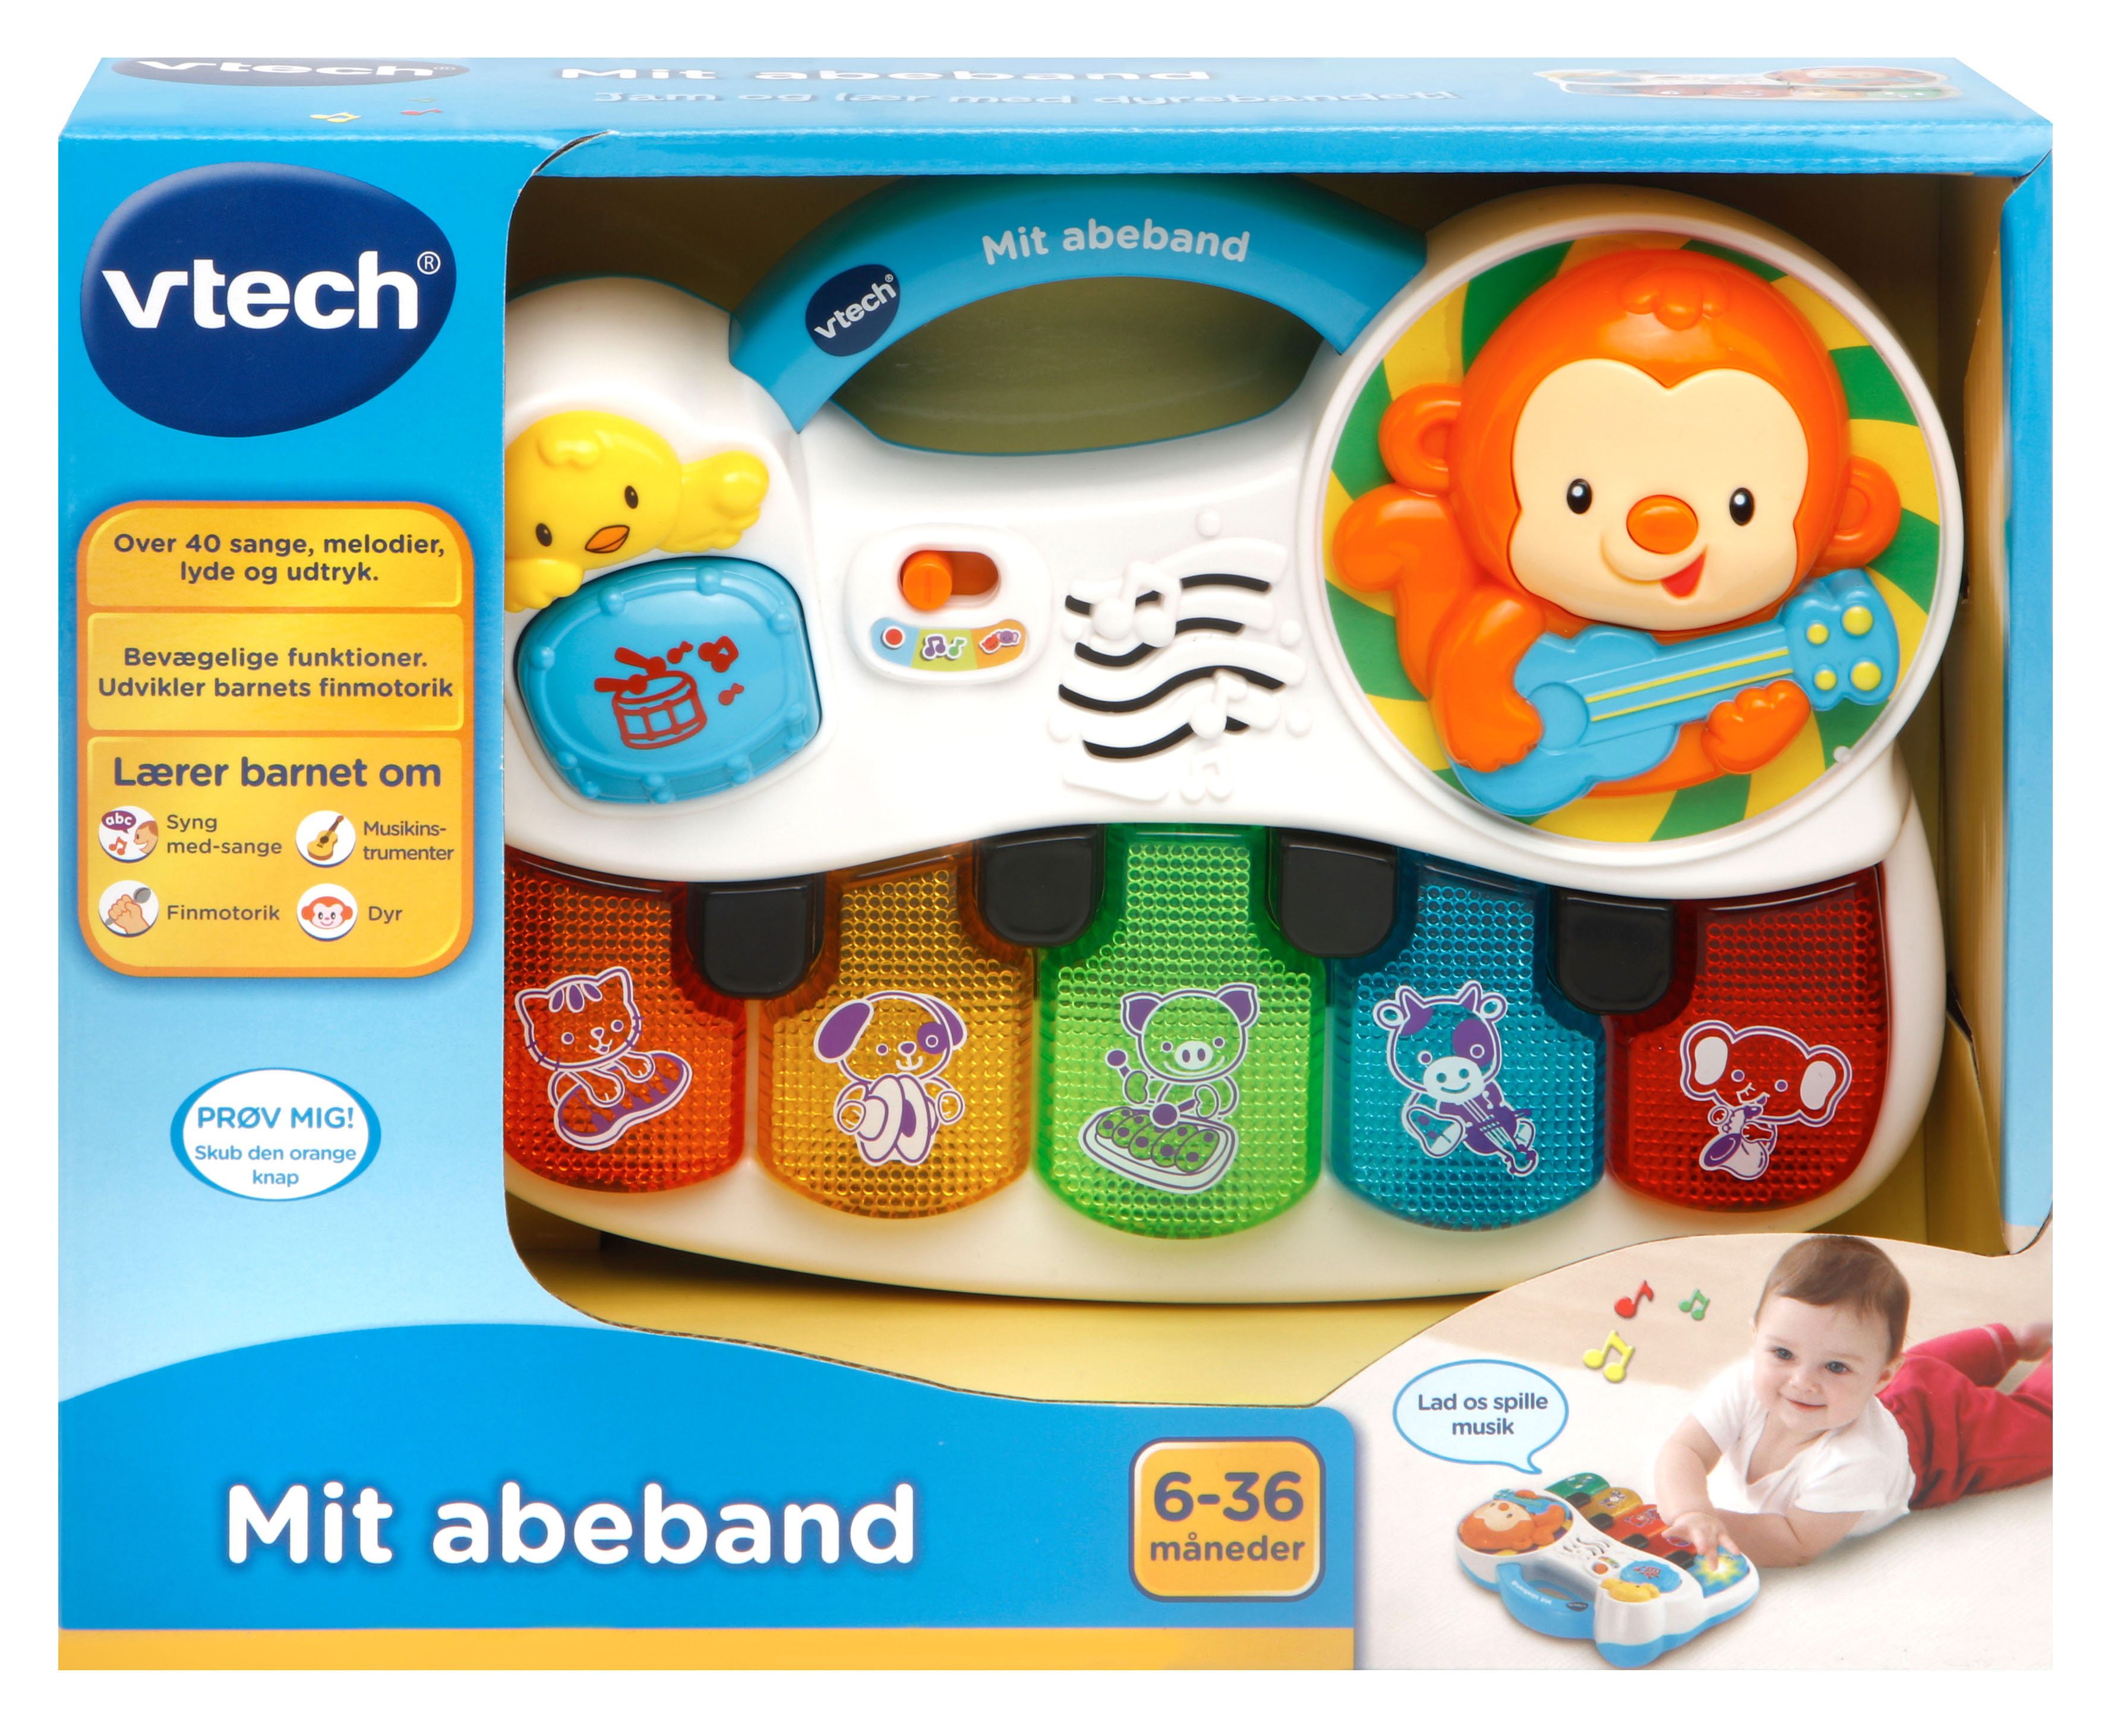 Baby Mit Abeband (Dansk)